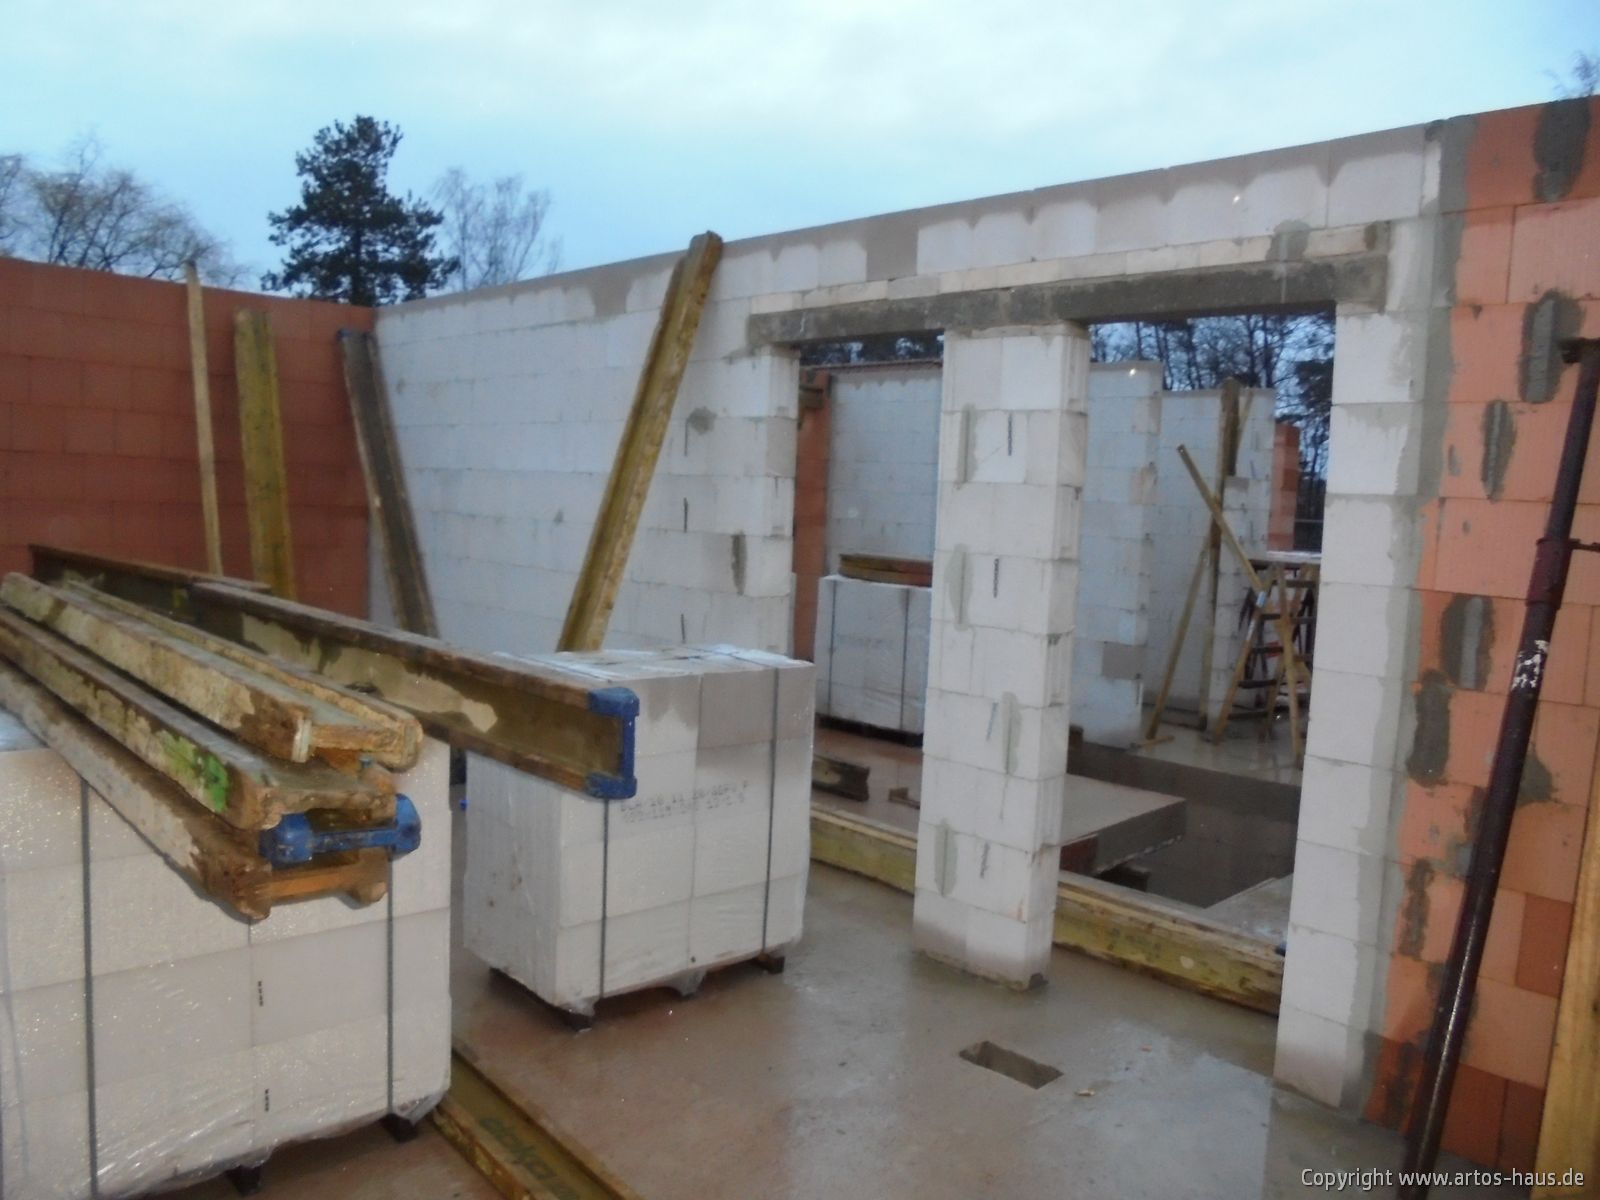 Rohbau der Baustelle in Bonn im Januar 2021 / ARTOS-HAUS Bild 6